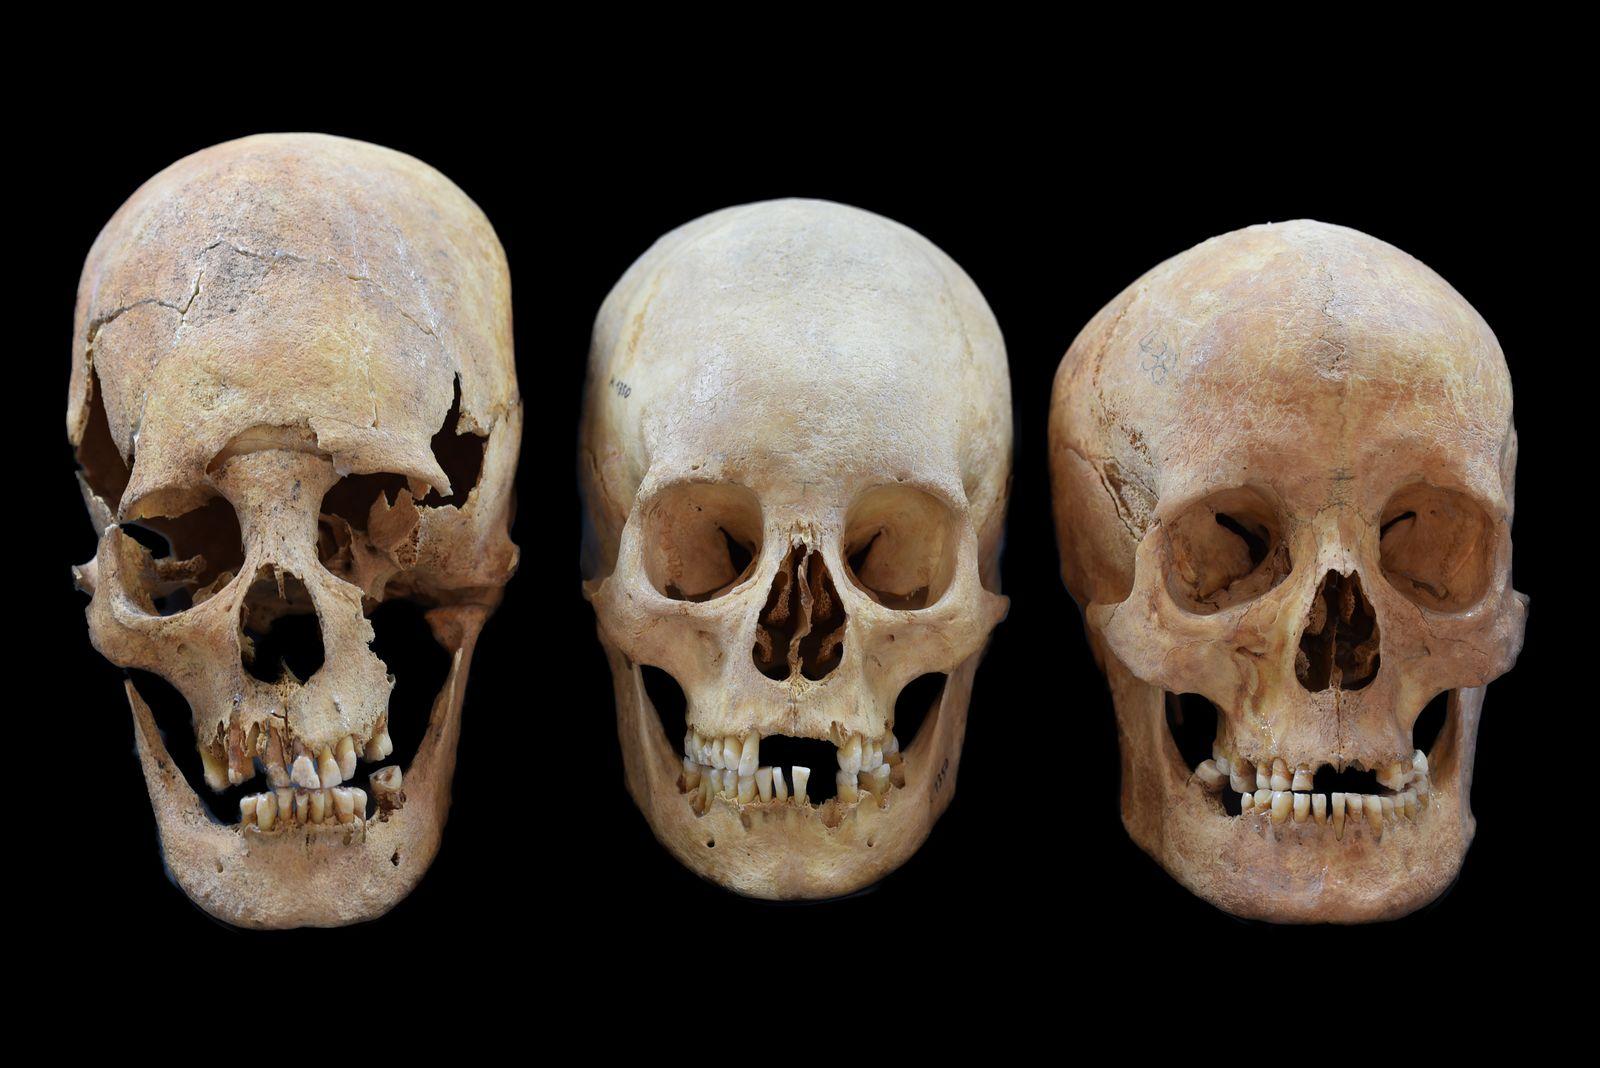 EINMALIGE VERWENDUNG A Deformed, Intermediate, and Non-deformed Human Skull